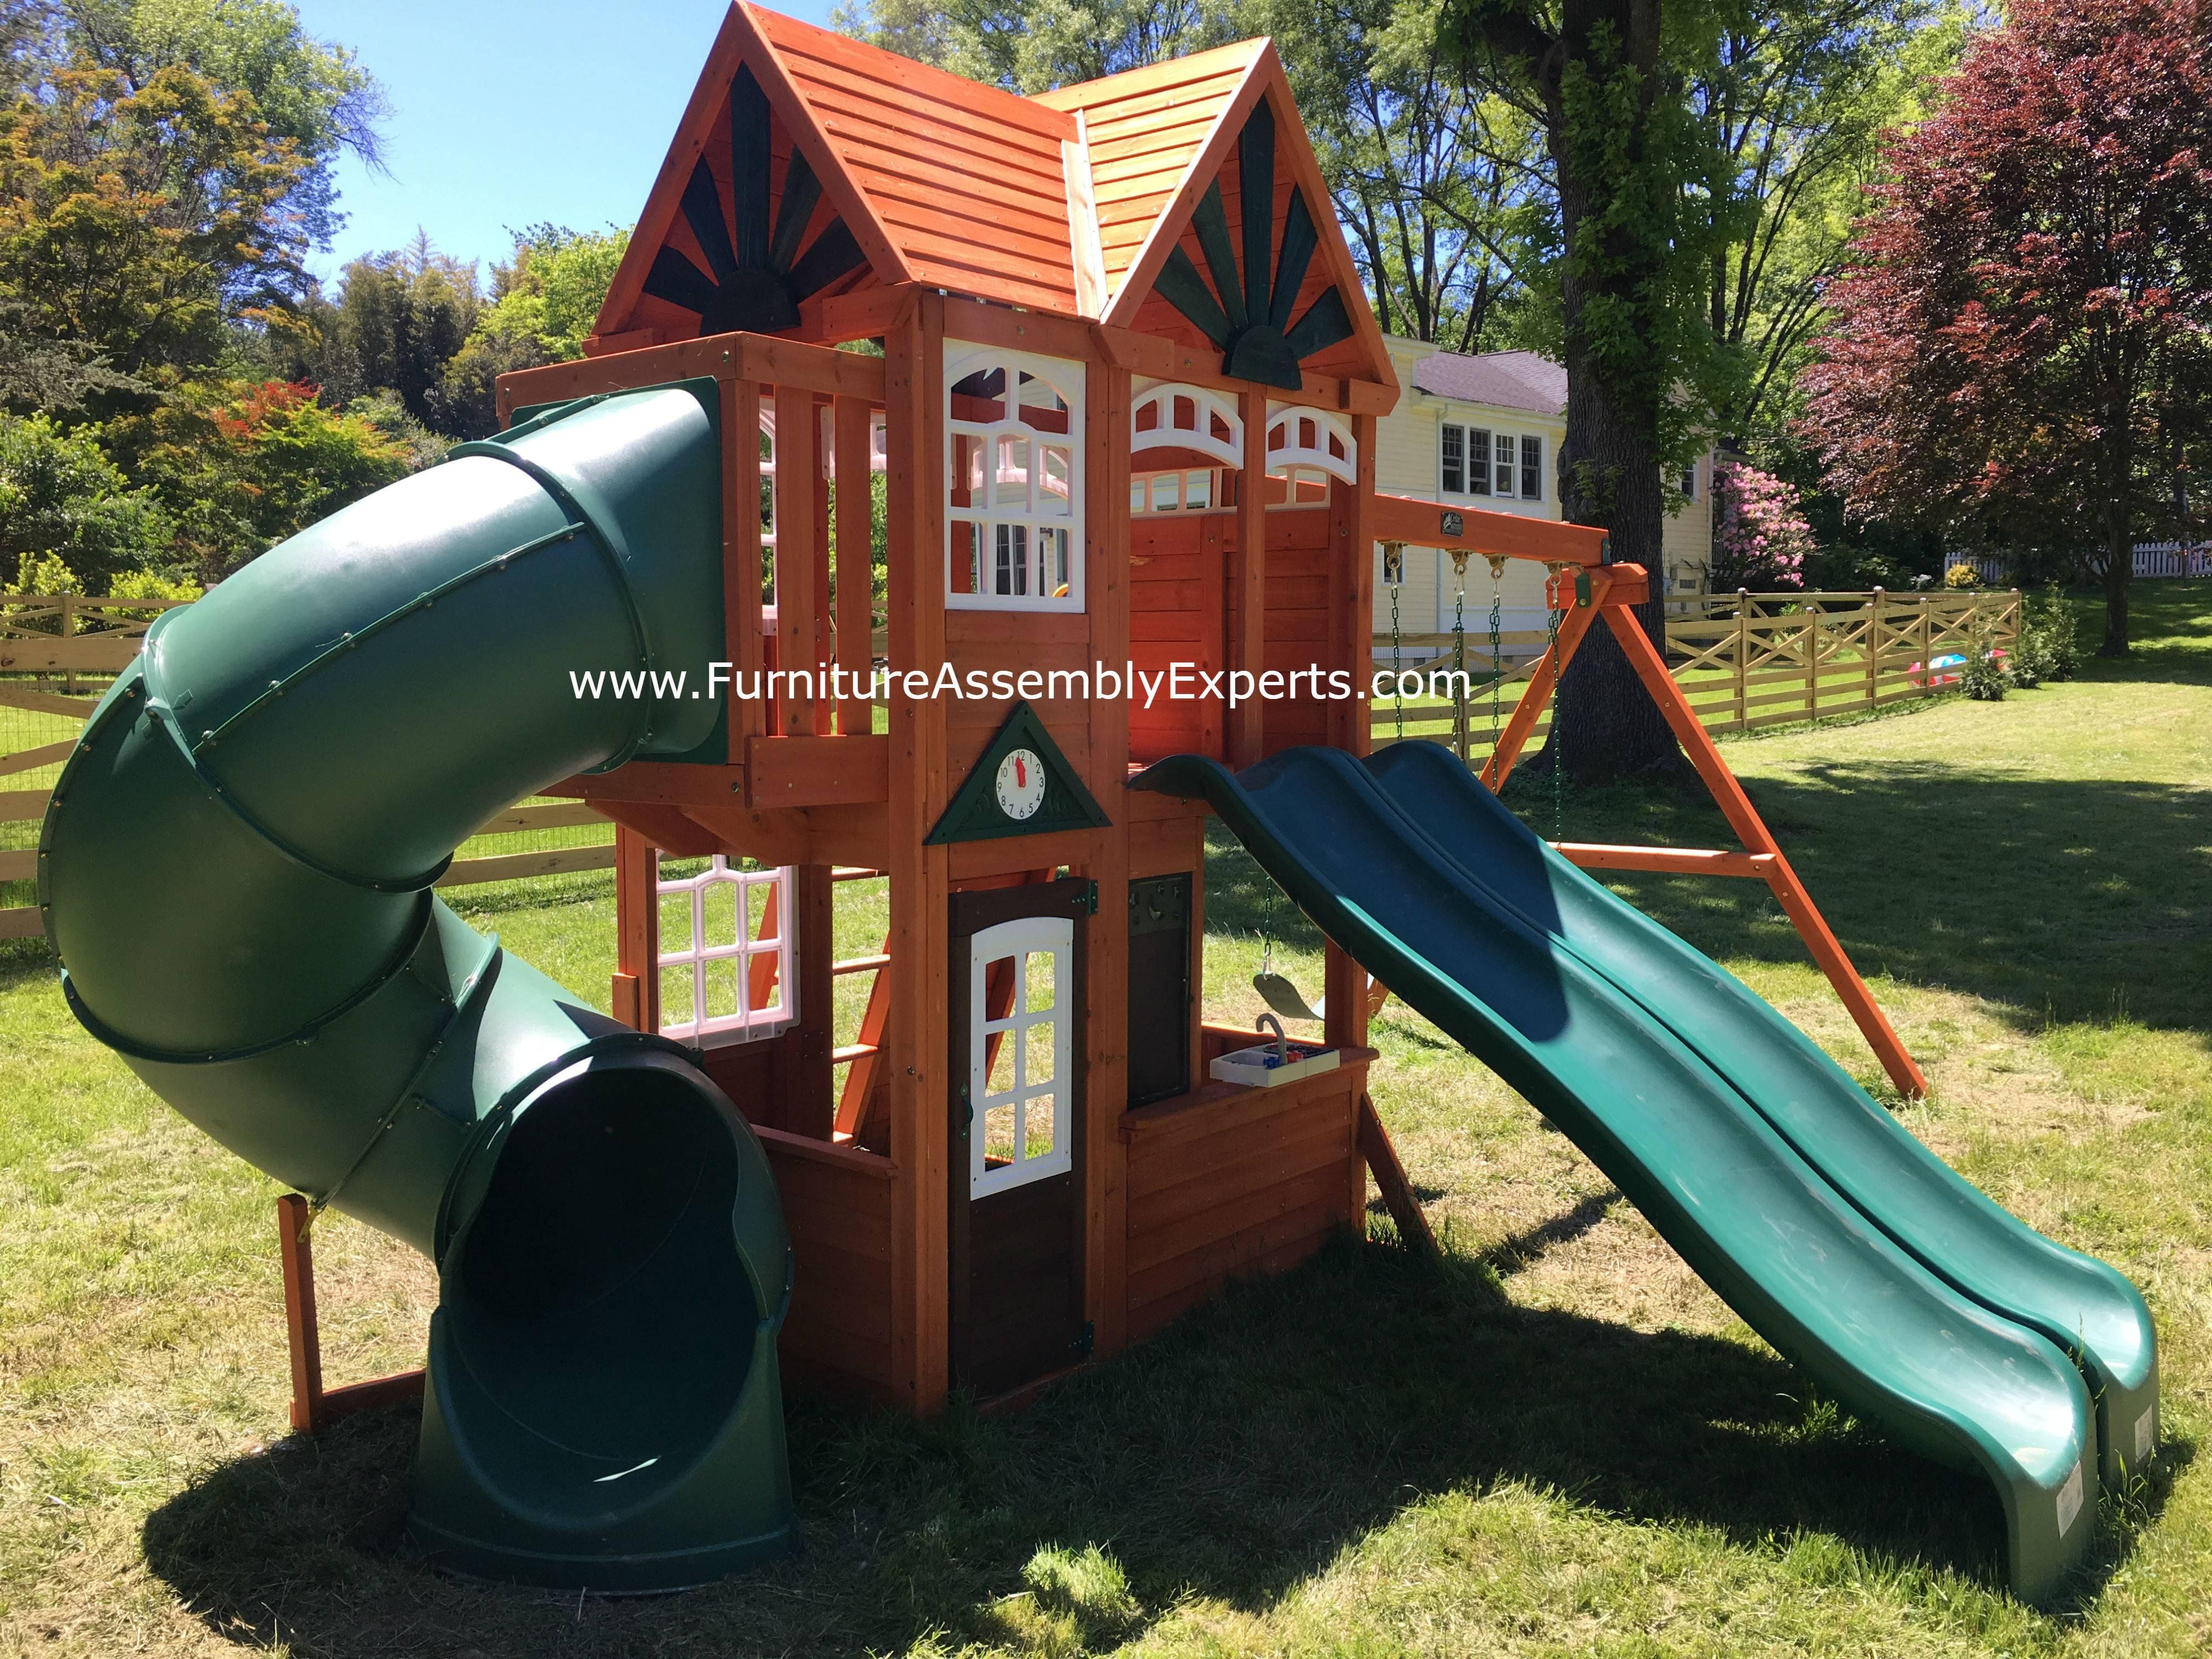 Cedar Summit Valleyview Deluxe Playset installation in falls church virginia